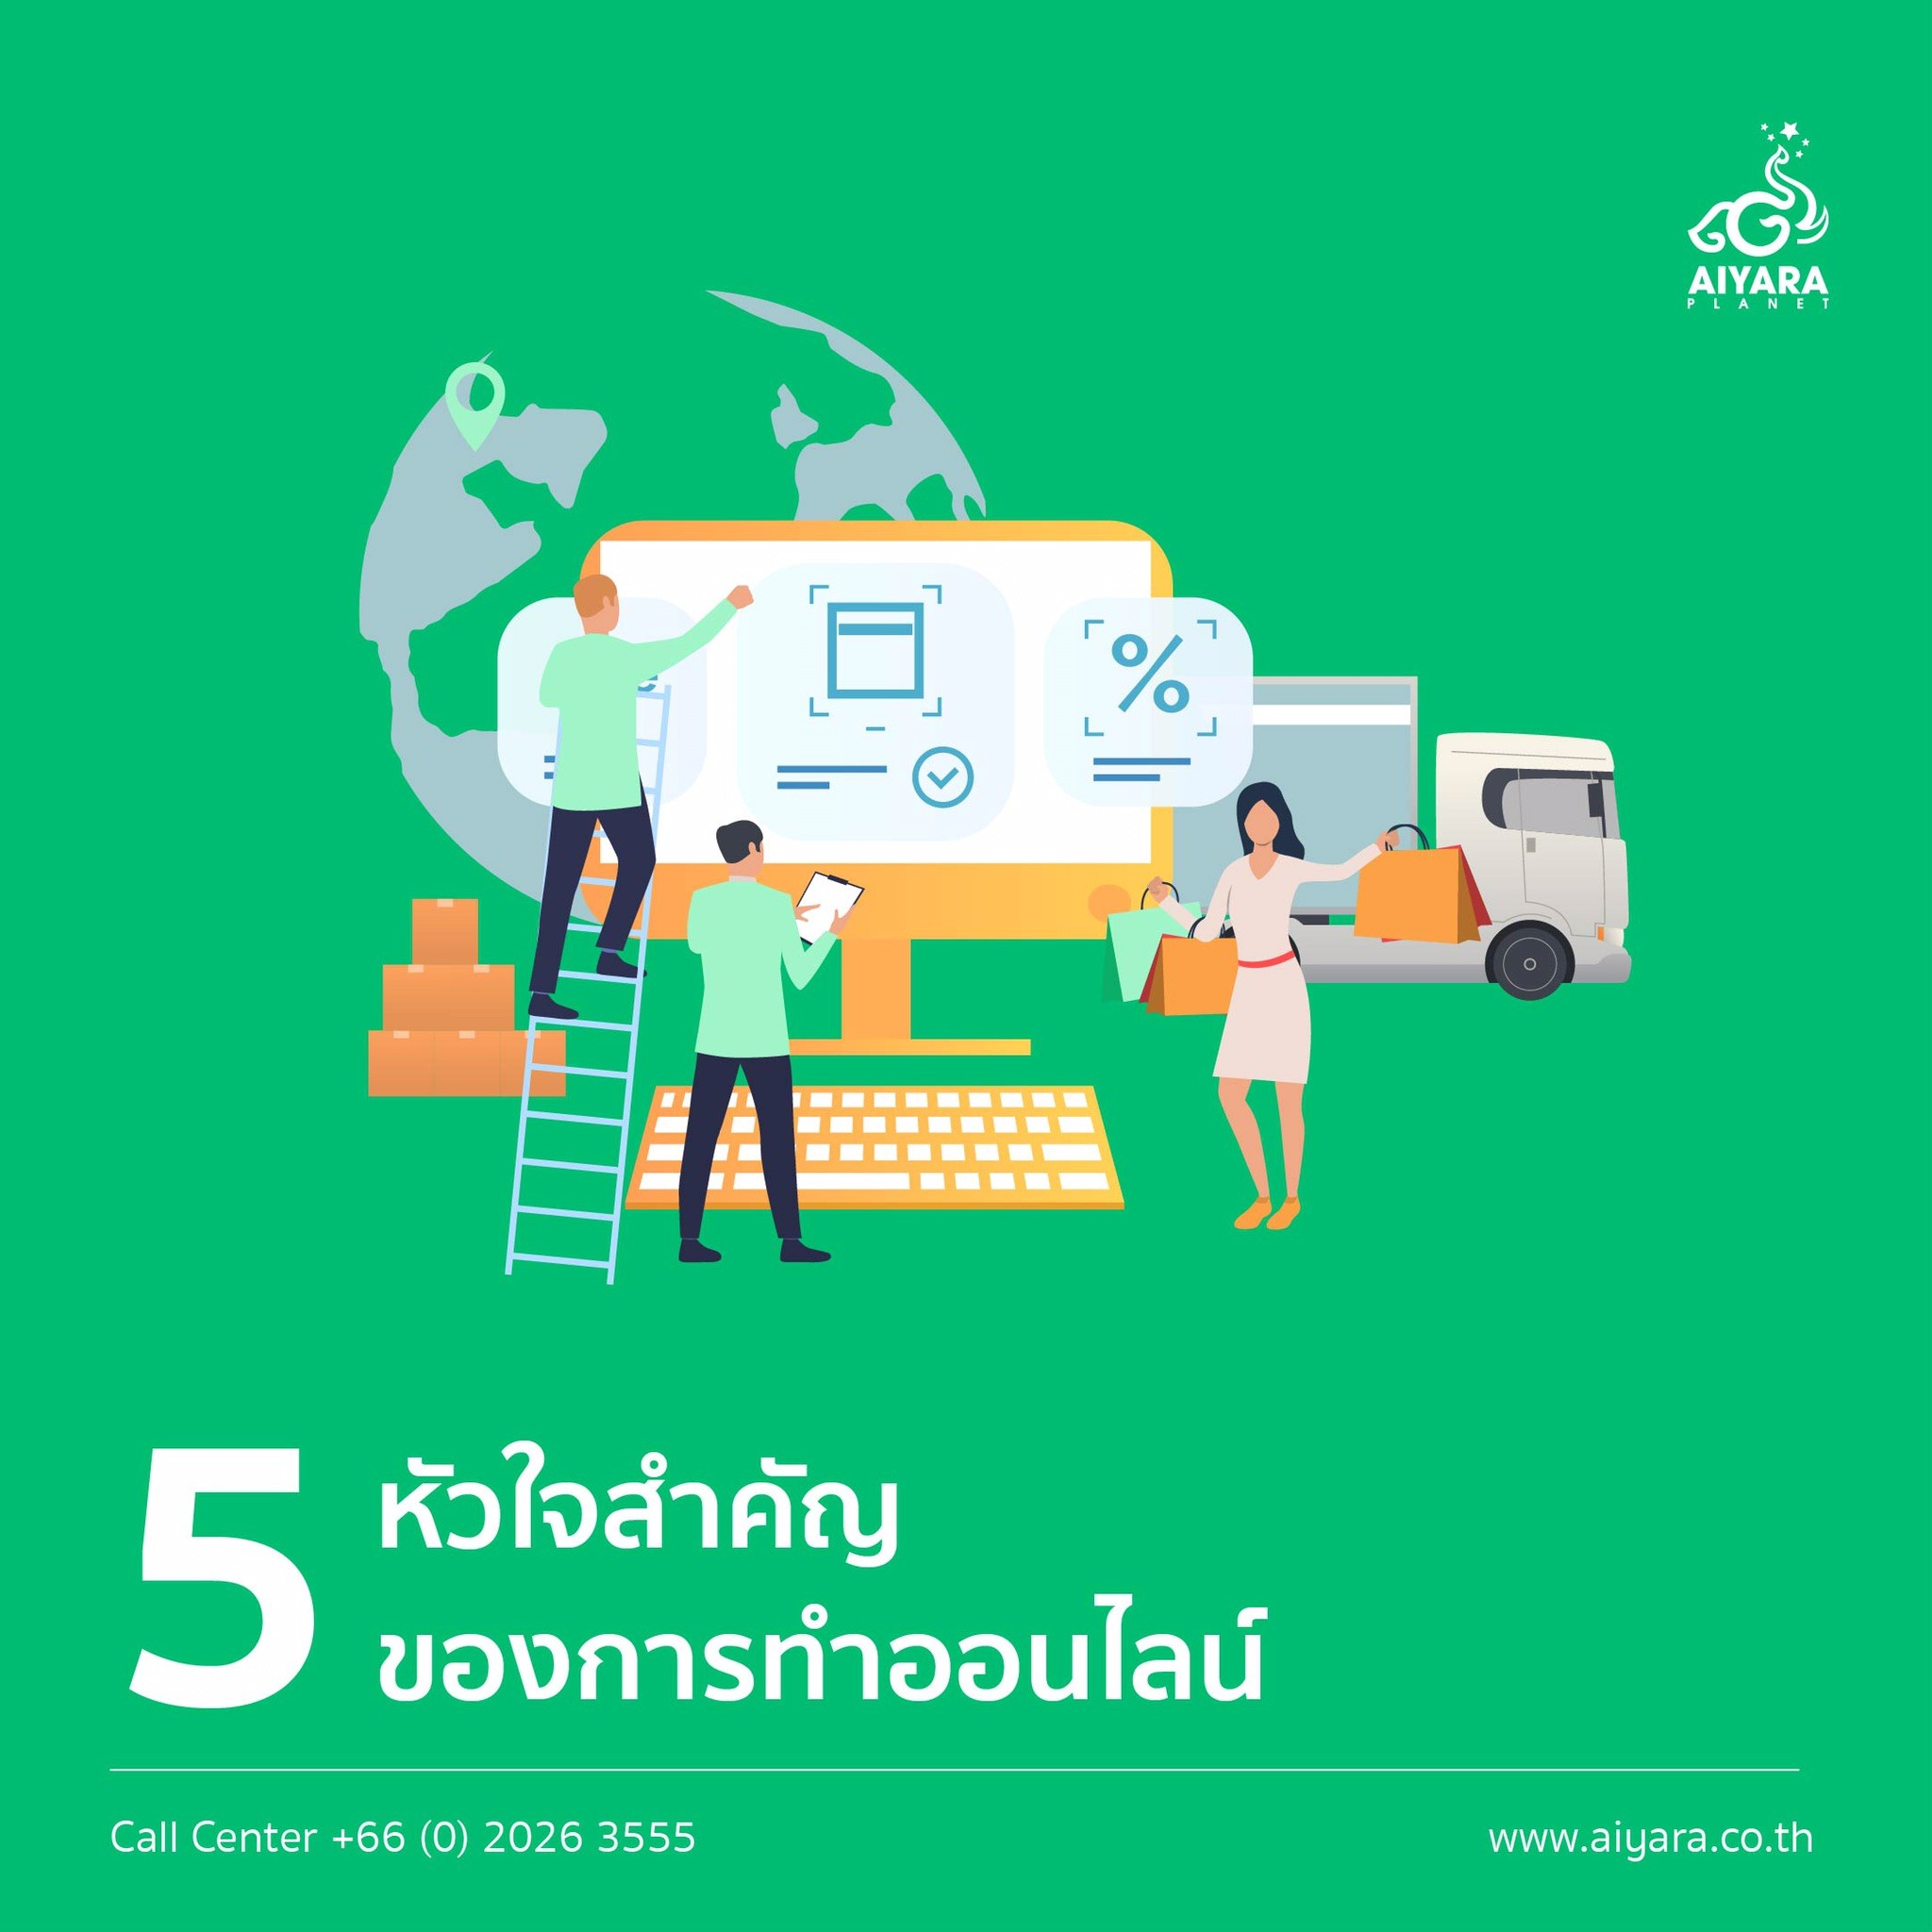 (Thai) 5 หัวใจสำคัญในการทำออนไลน์